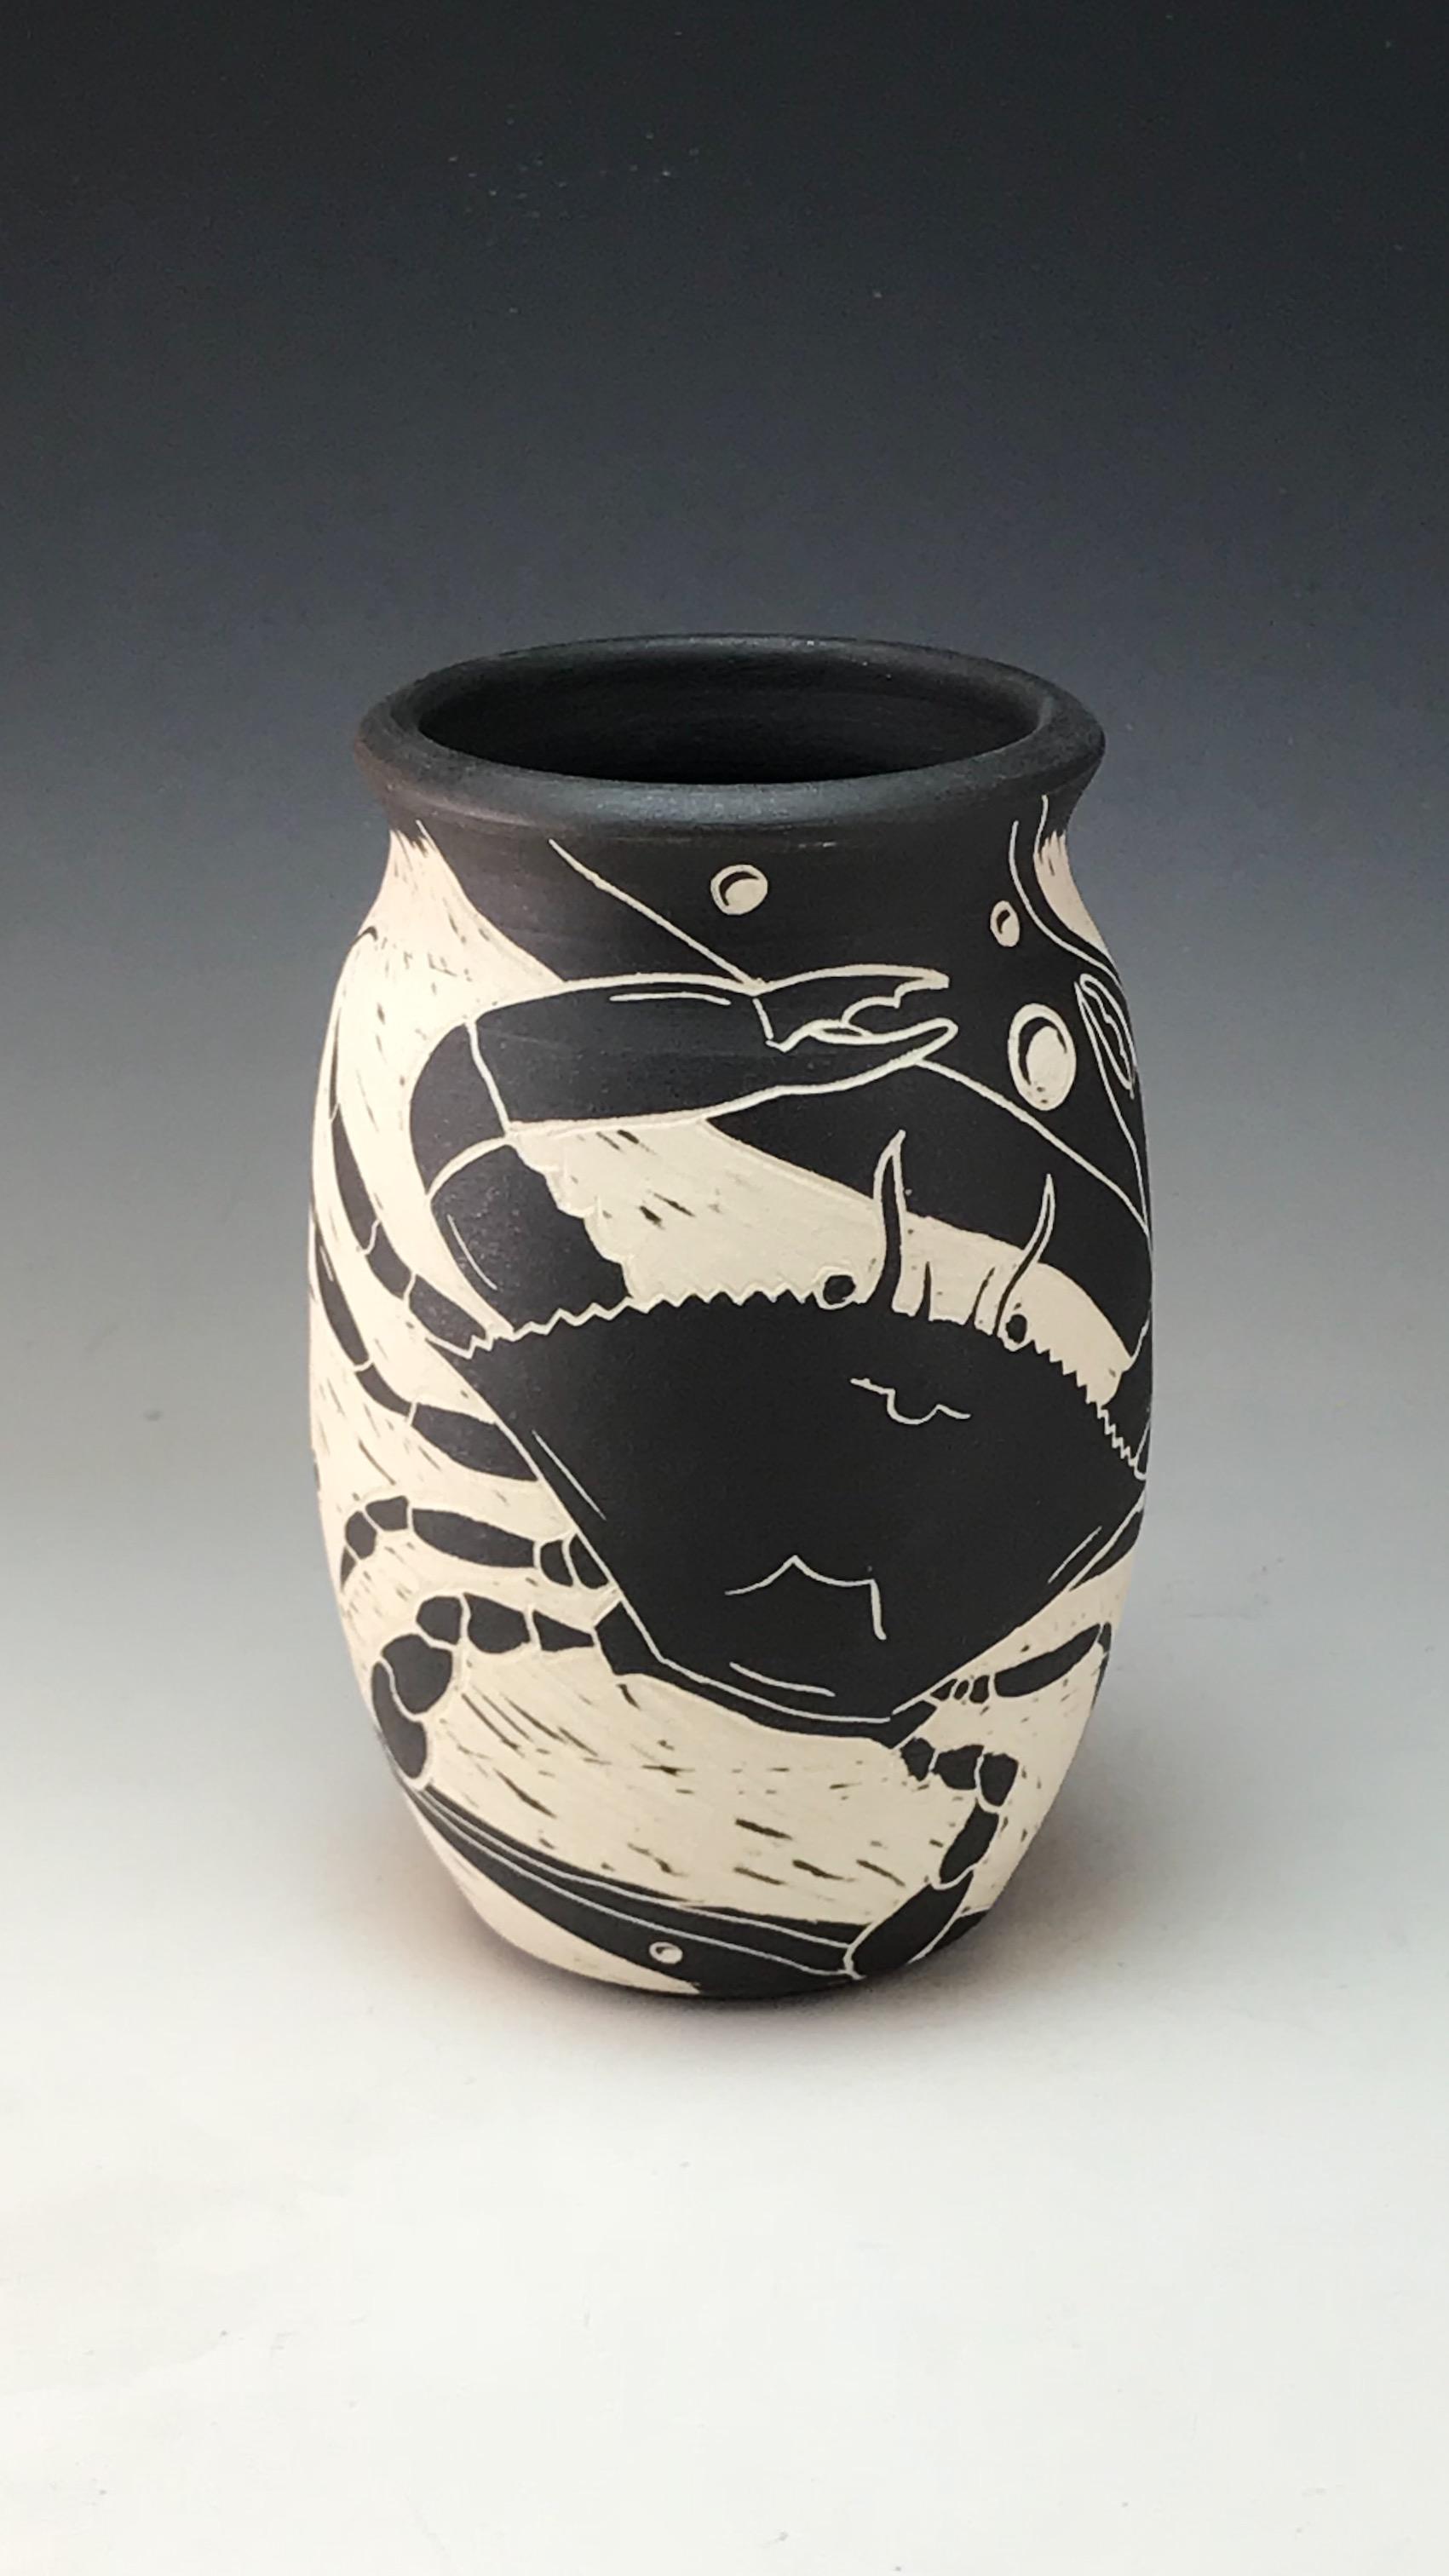 Sgraffito Crab Vase